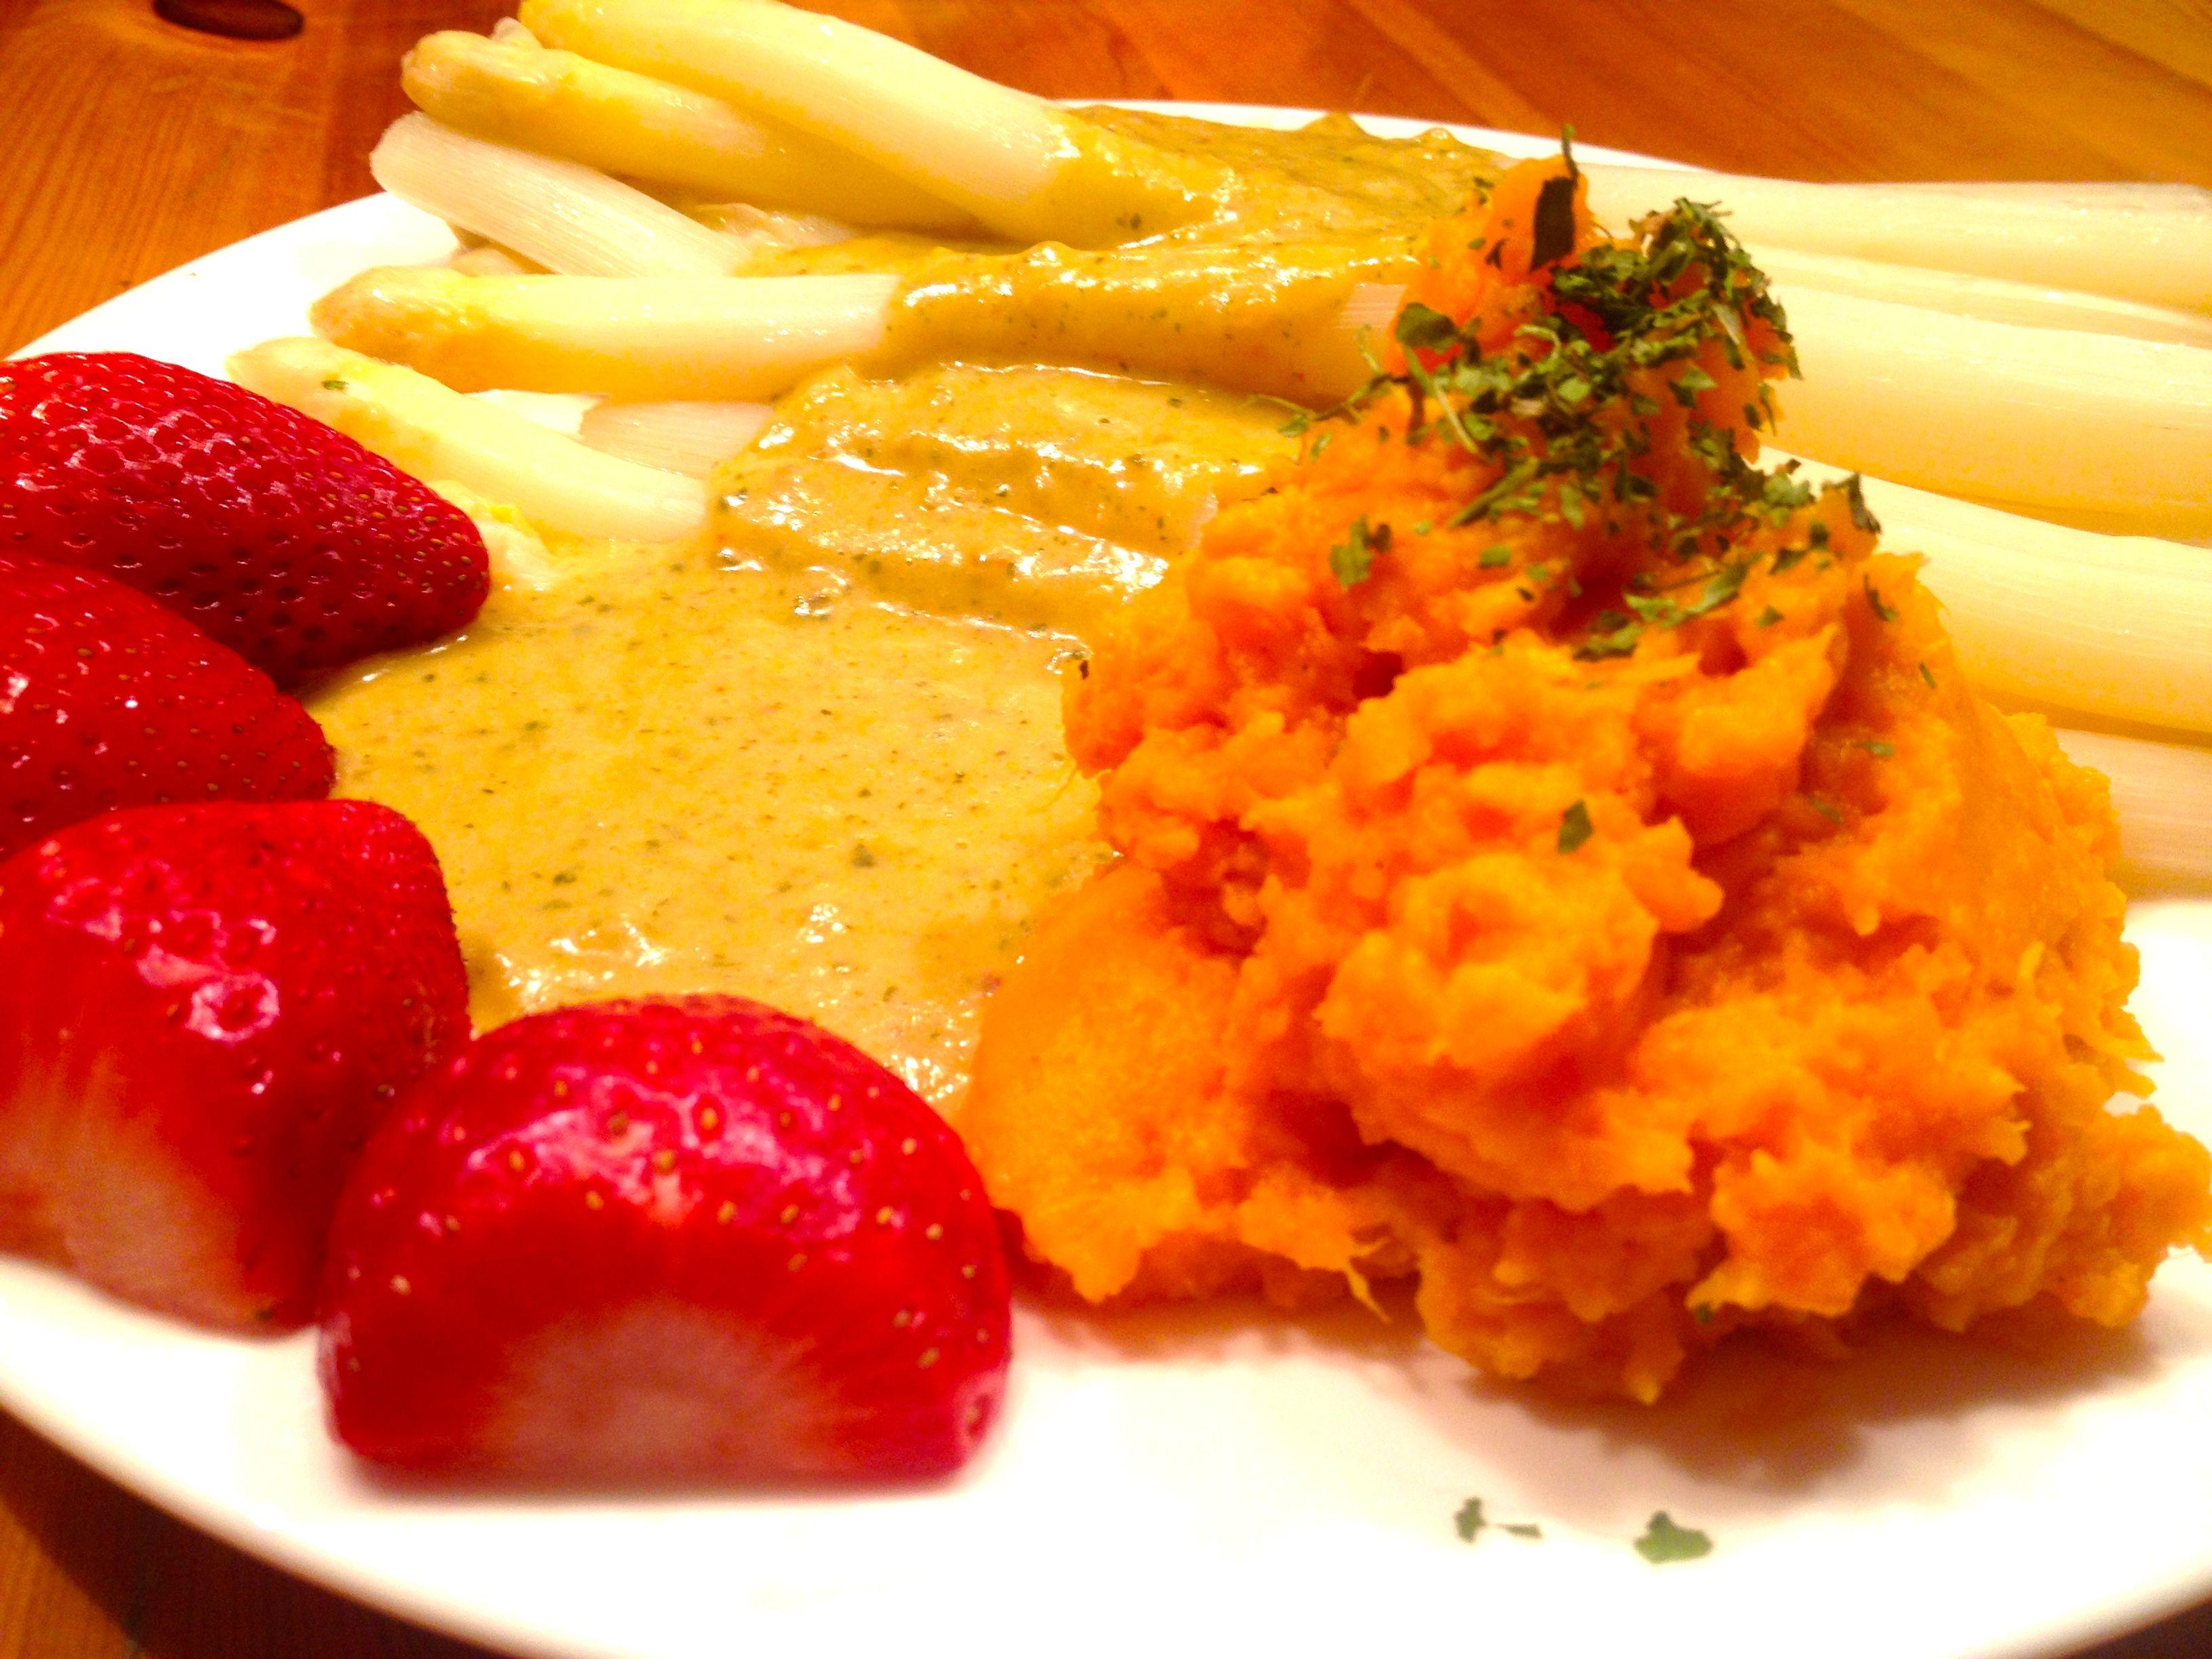 Spargel & Süßkartoffelpüree helle Soße Paleo&Vegan